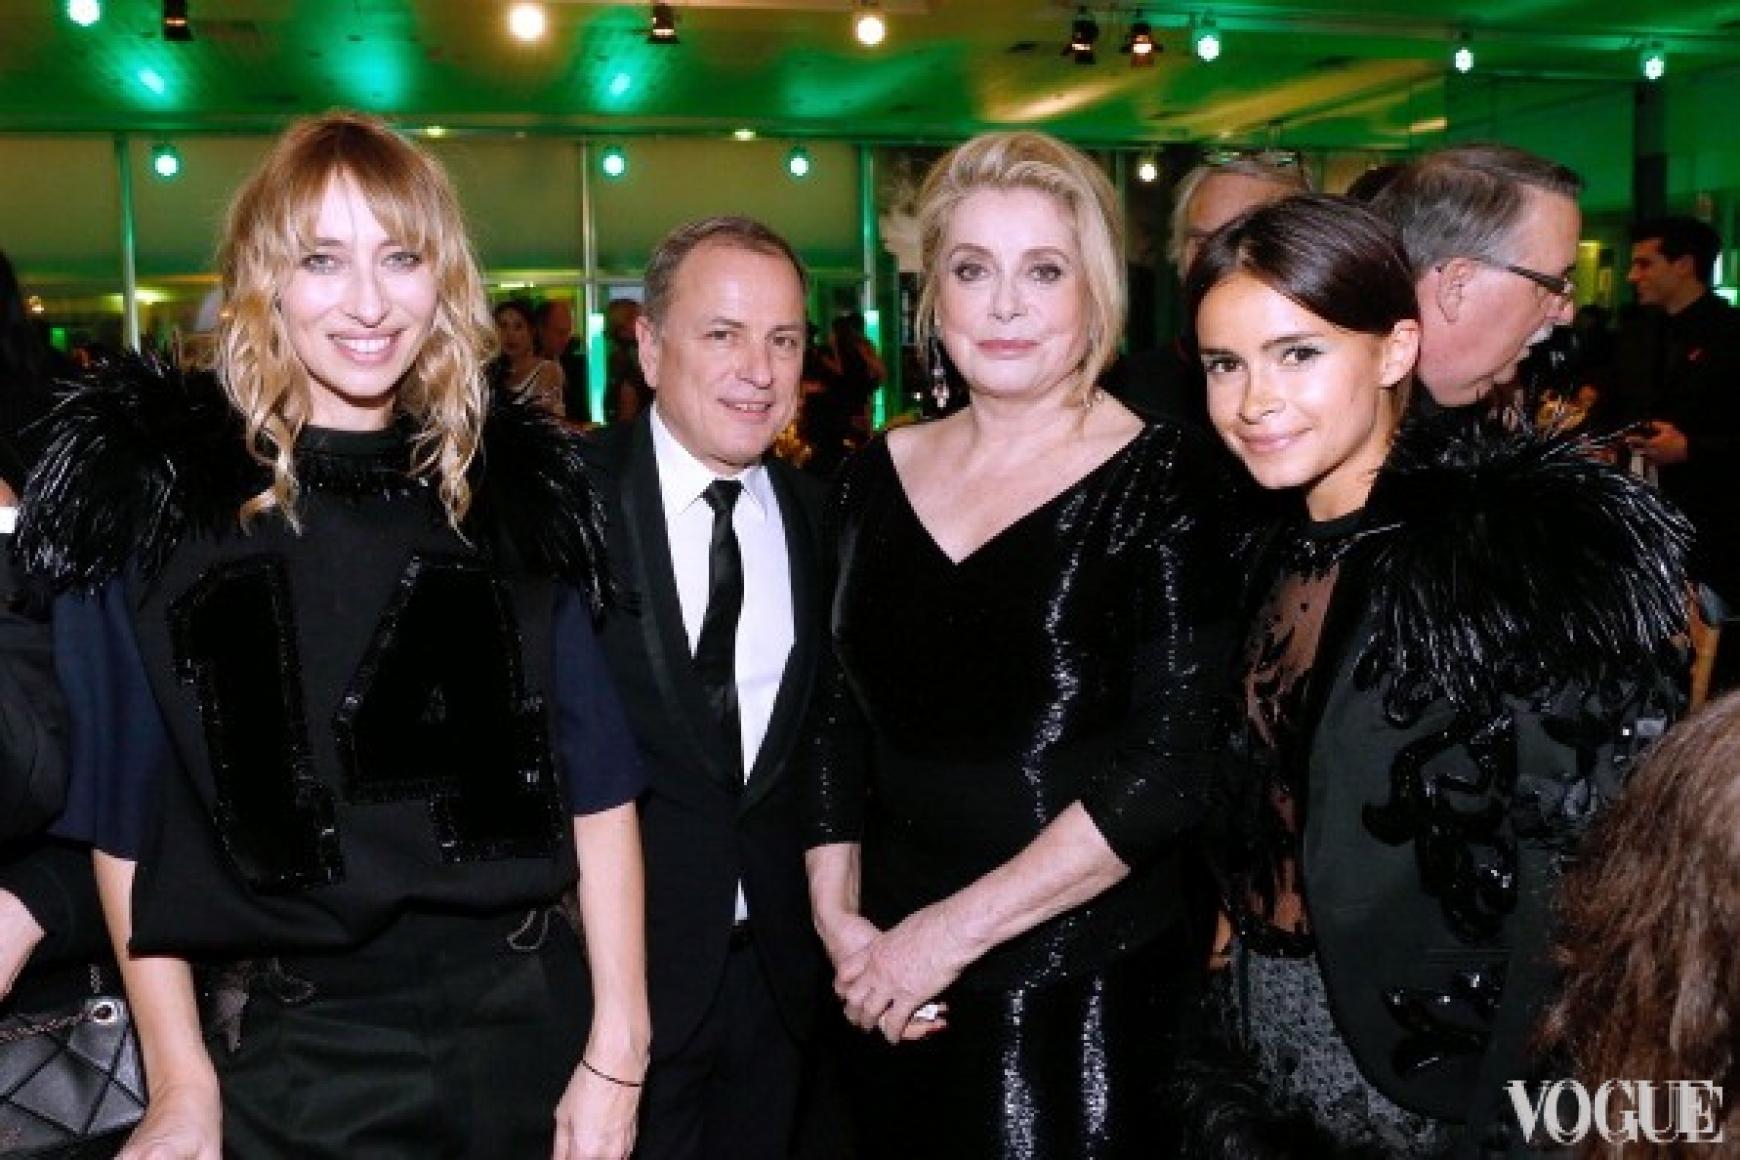 Александра Голованофф, Майкл Берк, Катрин Денев и Мирослава Дума